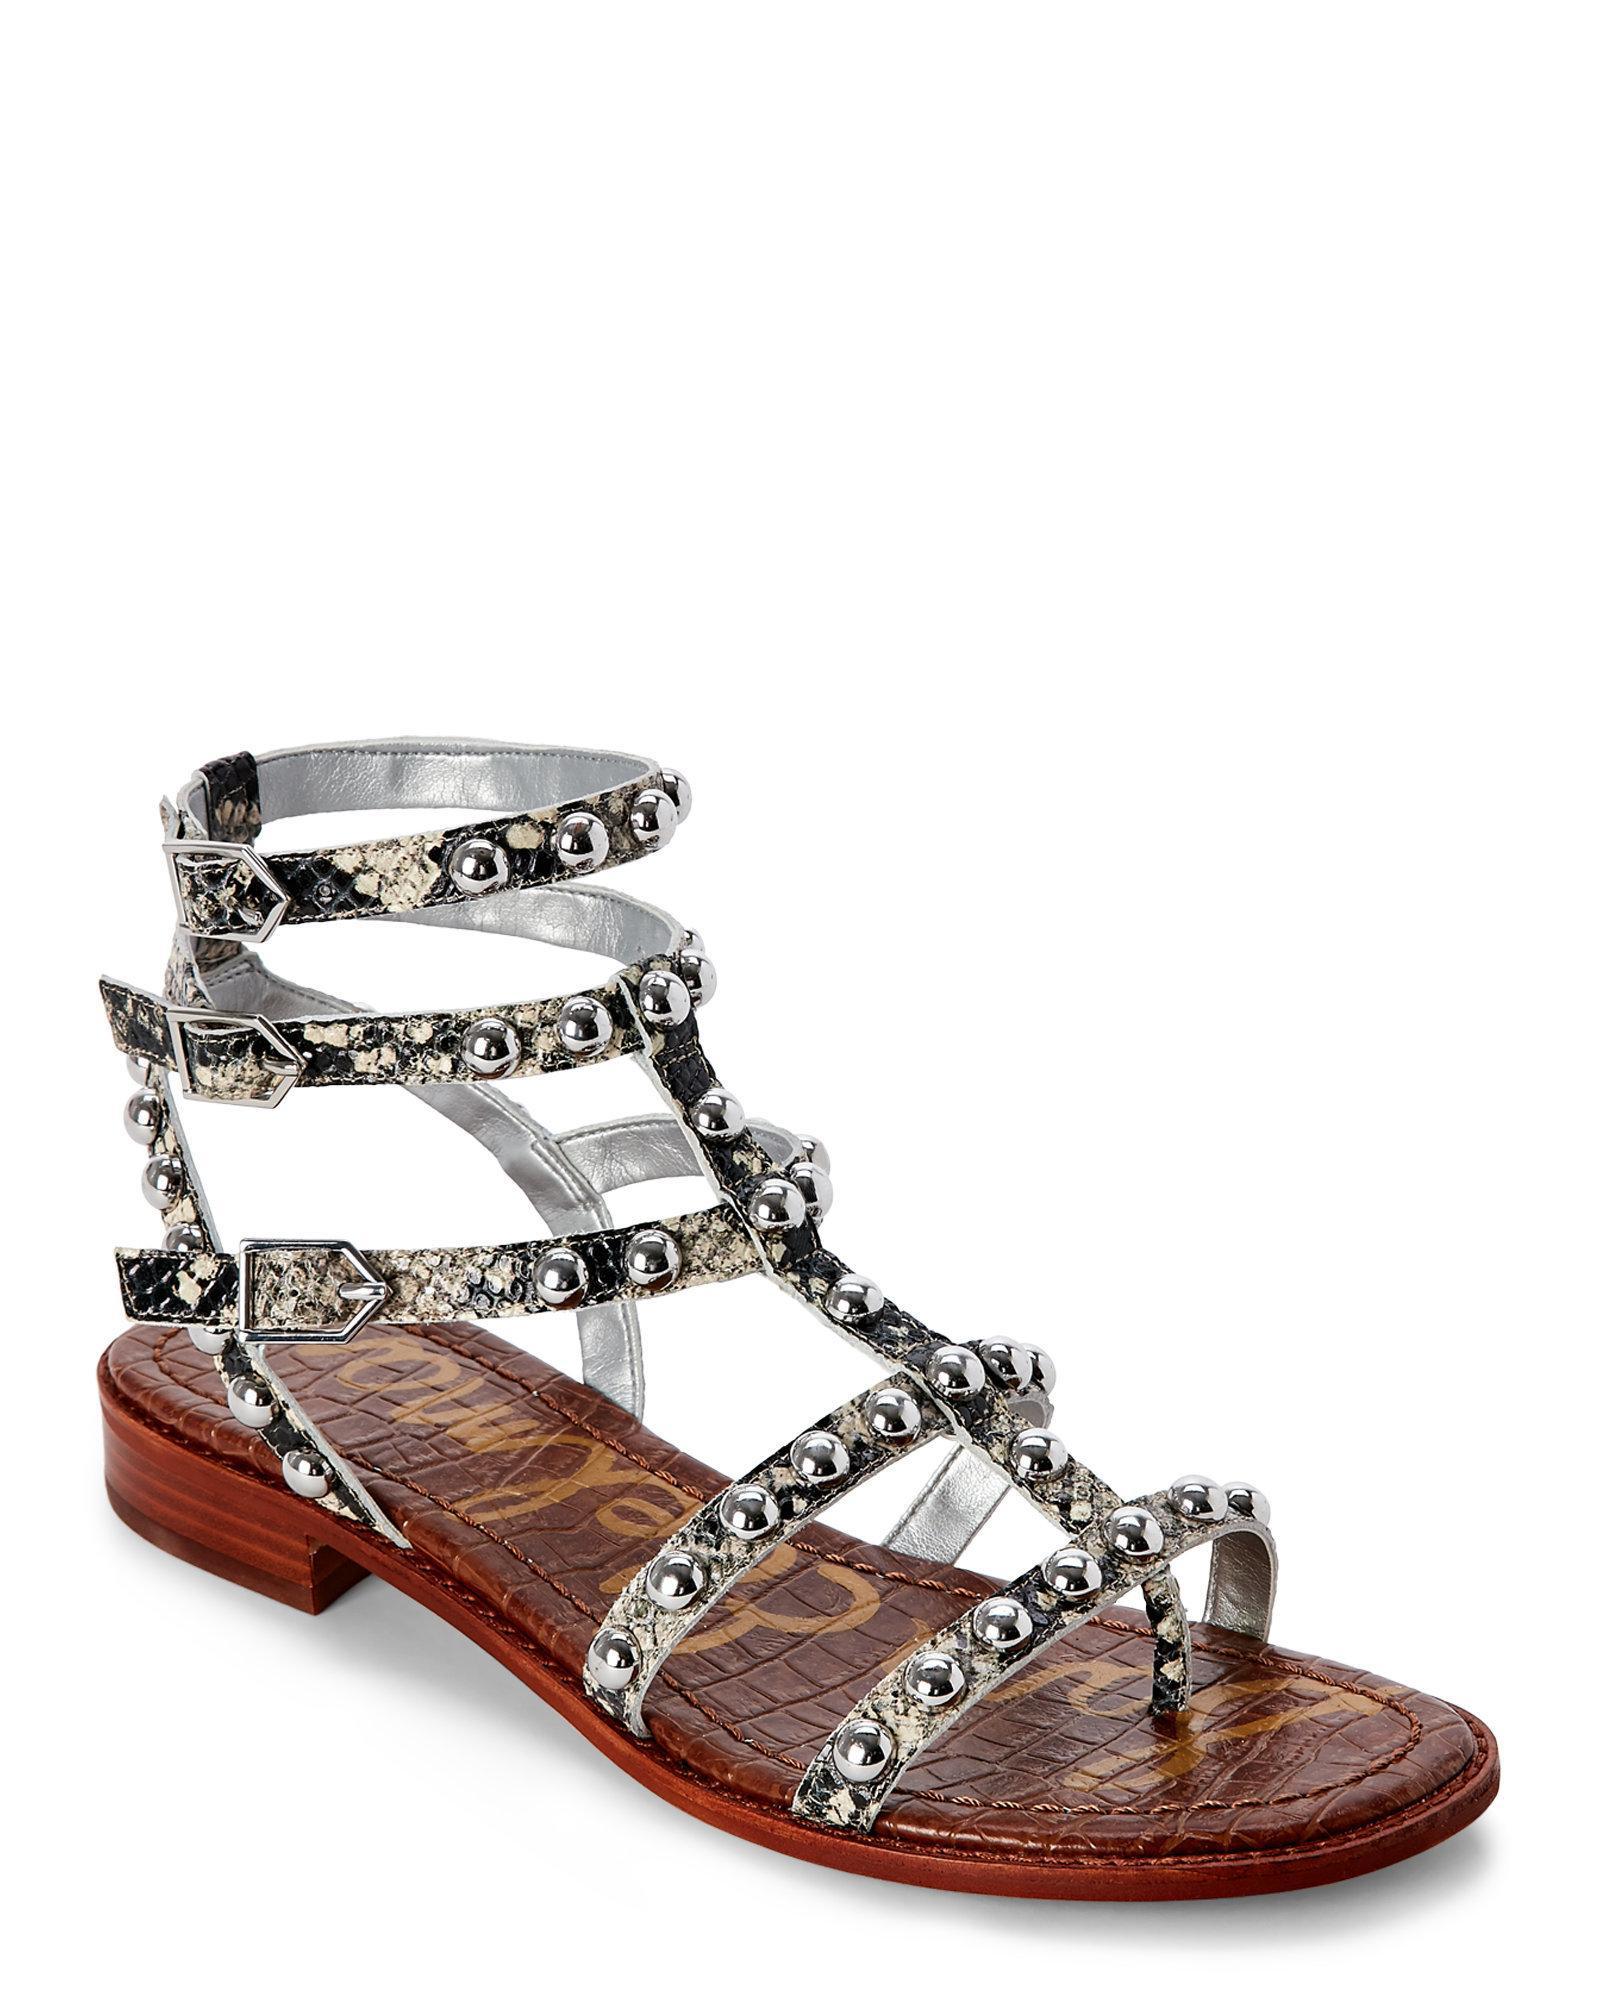 7bd635cd9eaf4c Lyst - Sam Edelman Putty Snake Eavan Studded Gladiator Sandals in ...